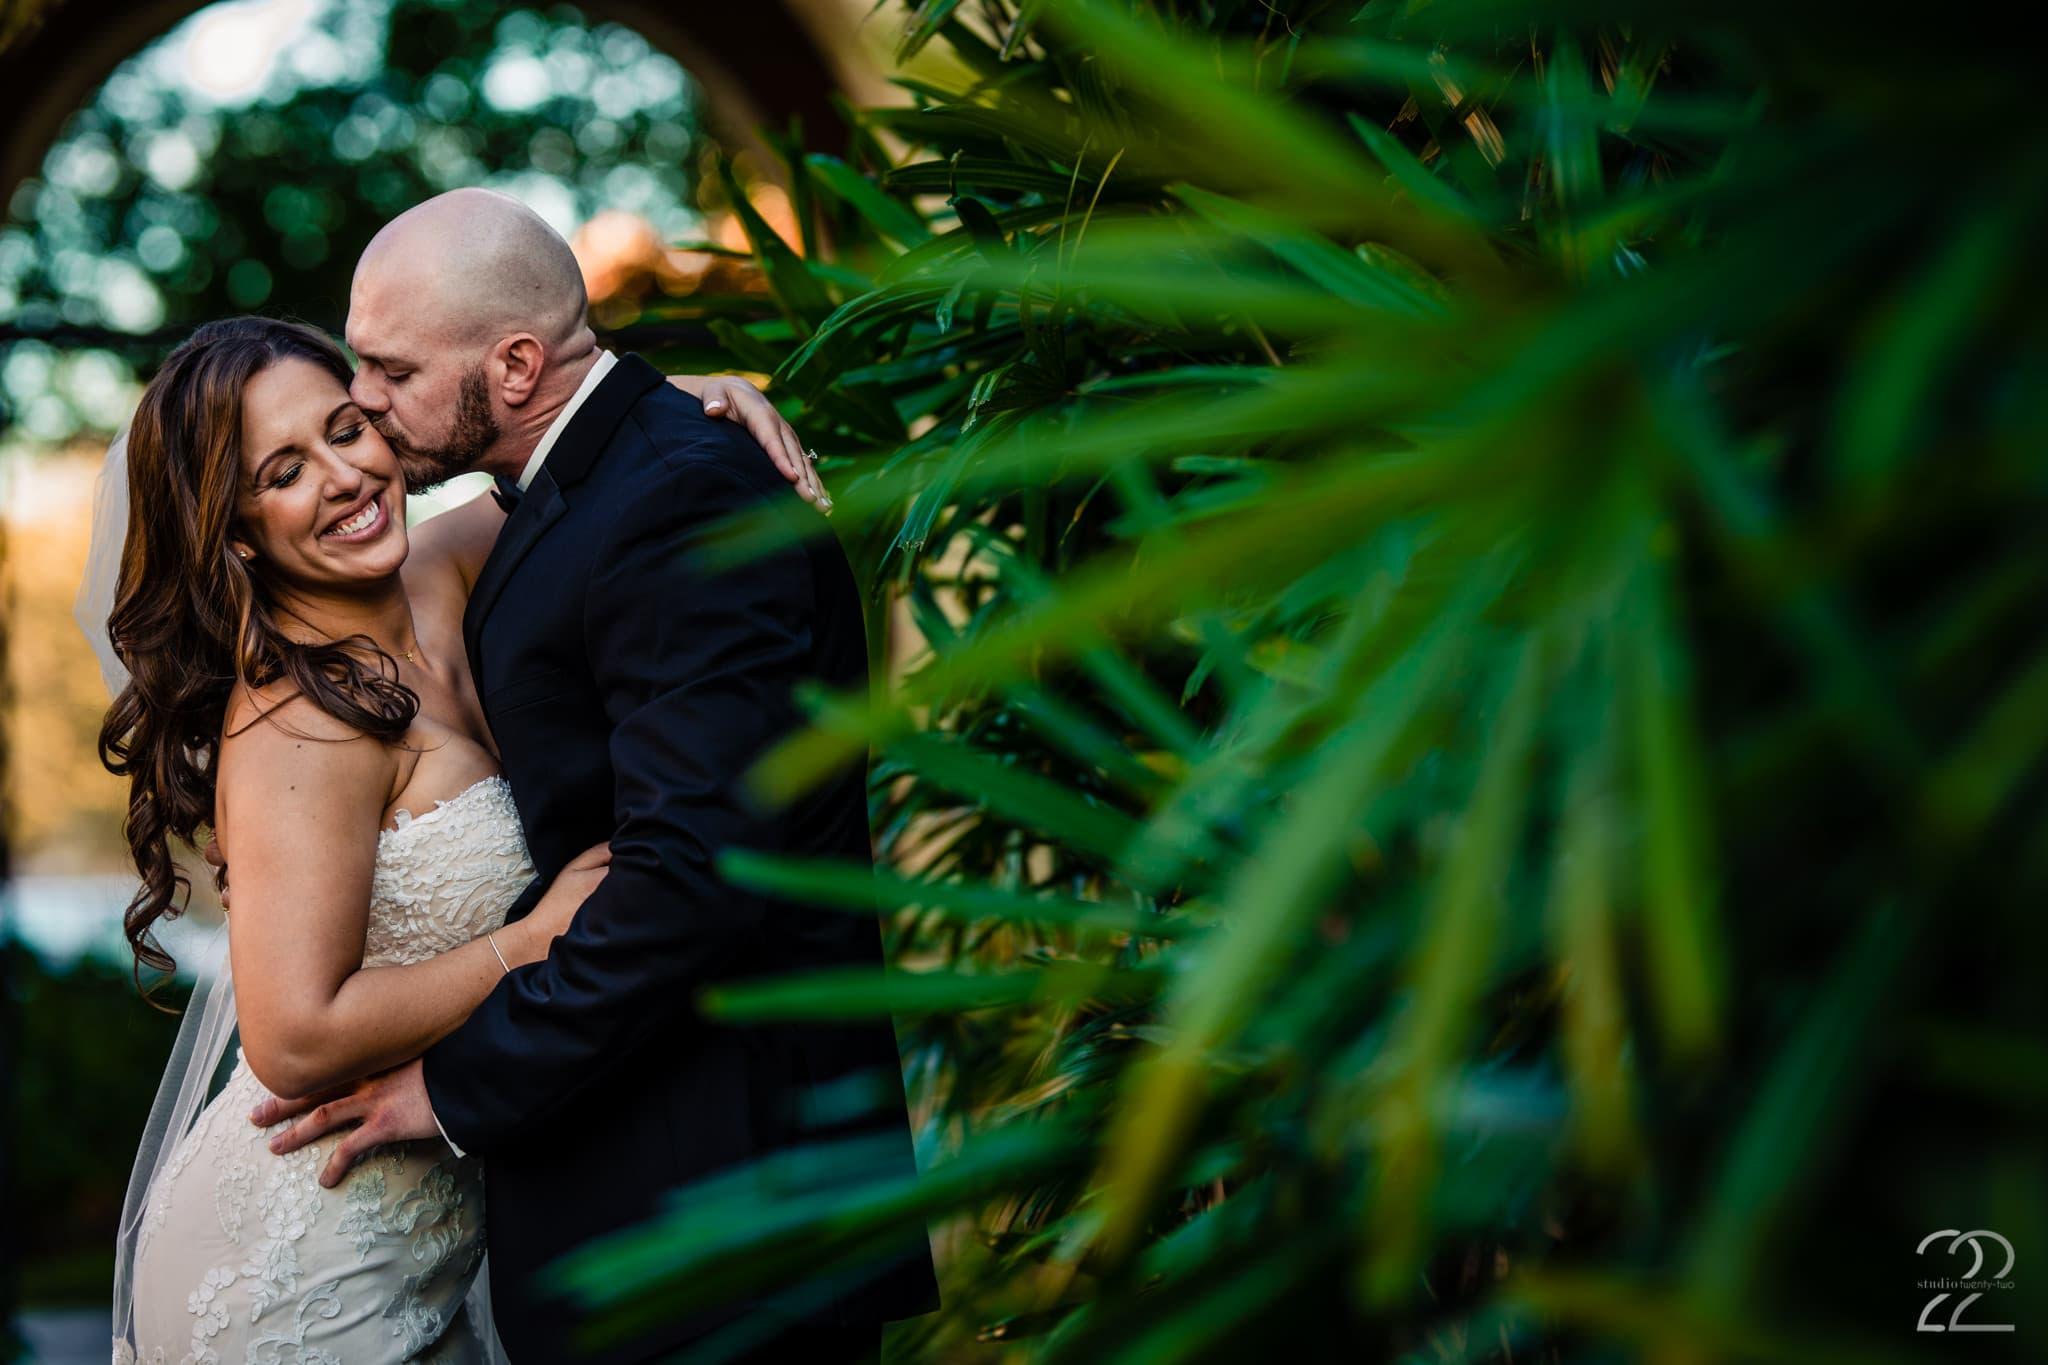 Studio 22 Photography - Naples Wedding Photographer - Sigma 105 Art